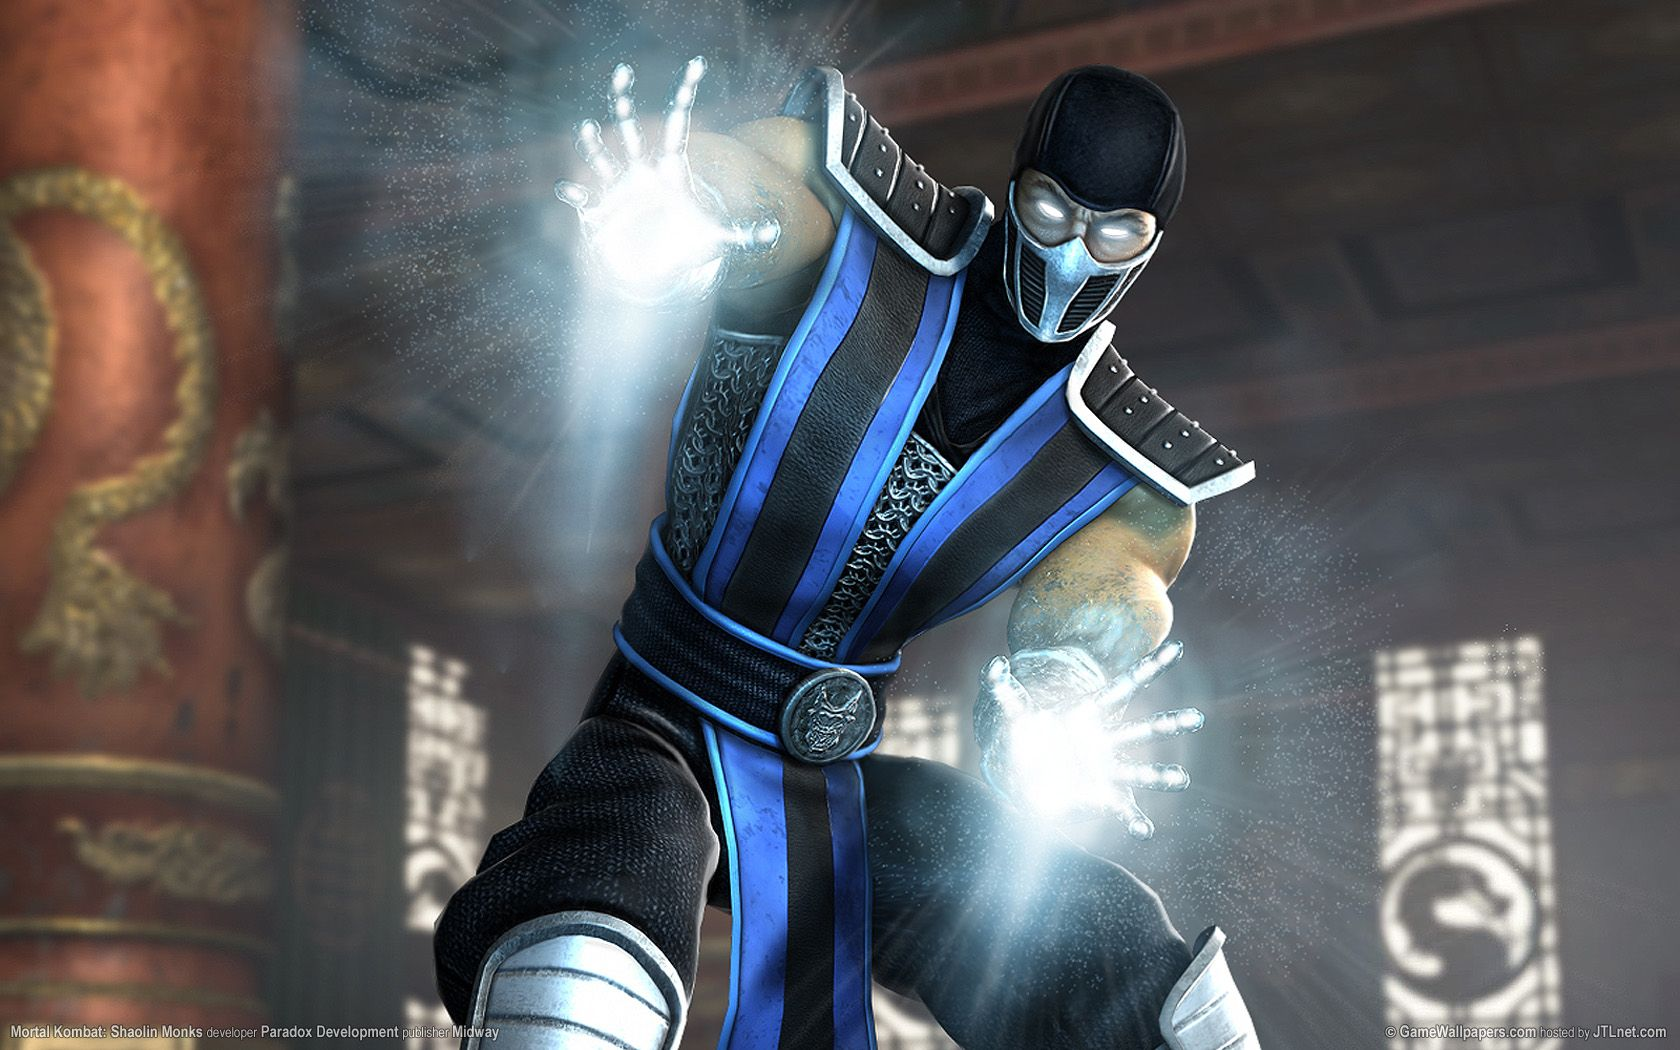 Mortal Kombat Wallpaper Mk Wallpapers Mortal Kombat Mortal Kombat Characters Mortal Kombat Shaolin Monks